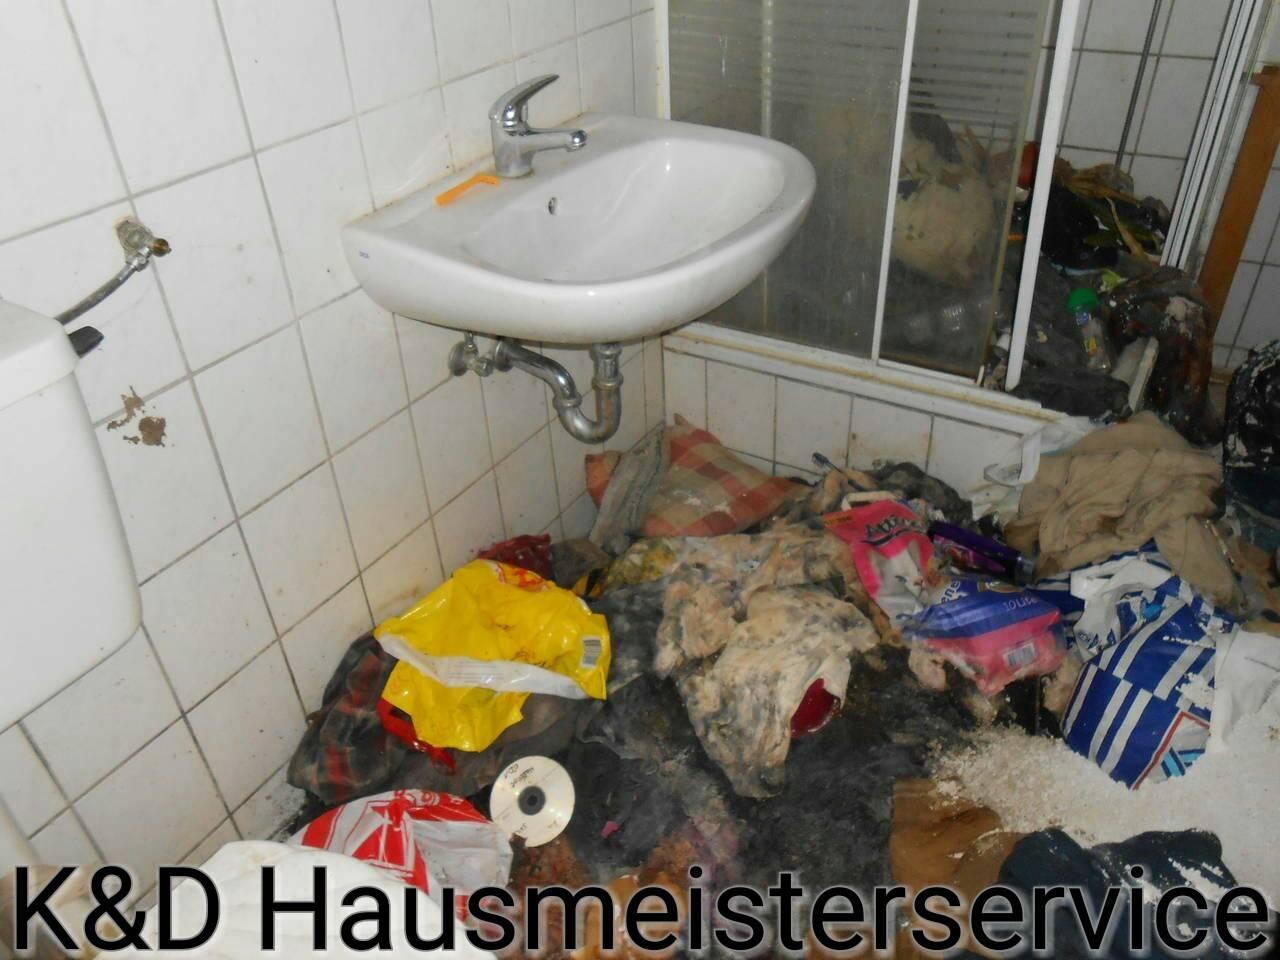 K&D Hausmeisterservice